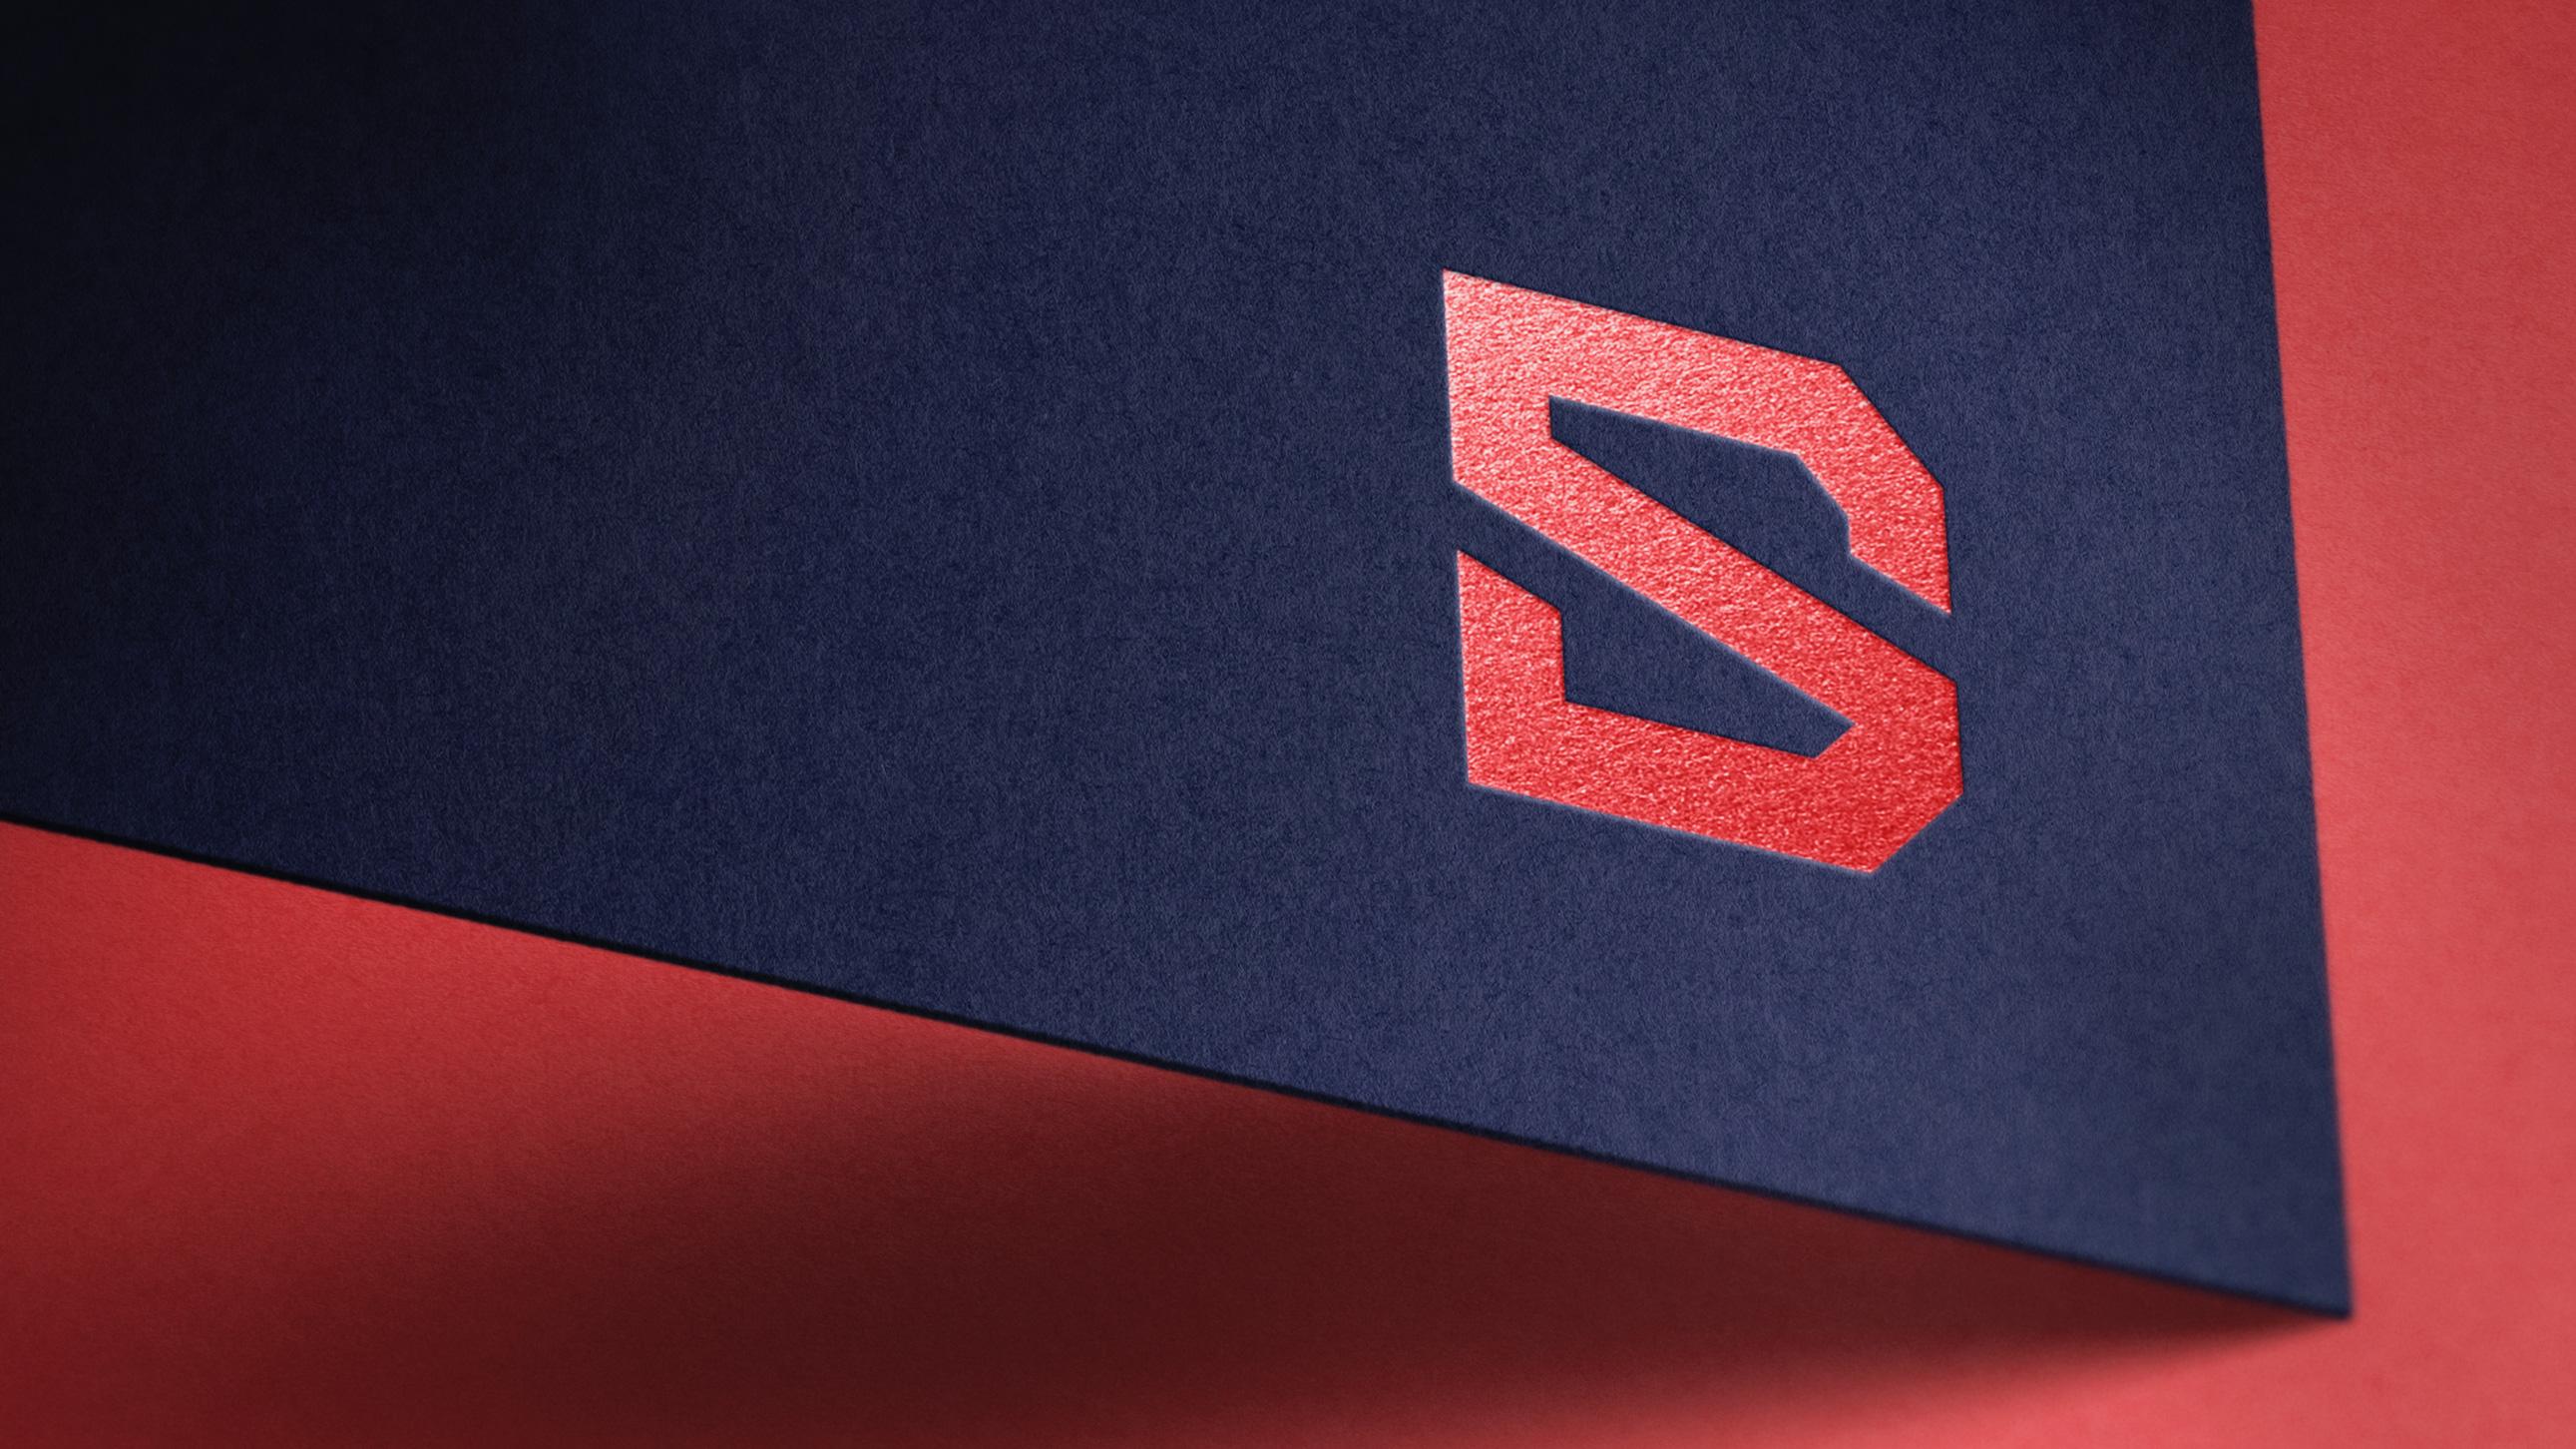 Re-envisioning Brand Identity Design For SleekDigital